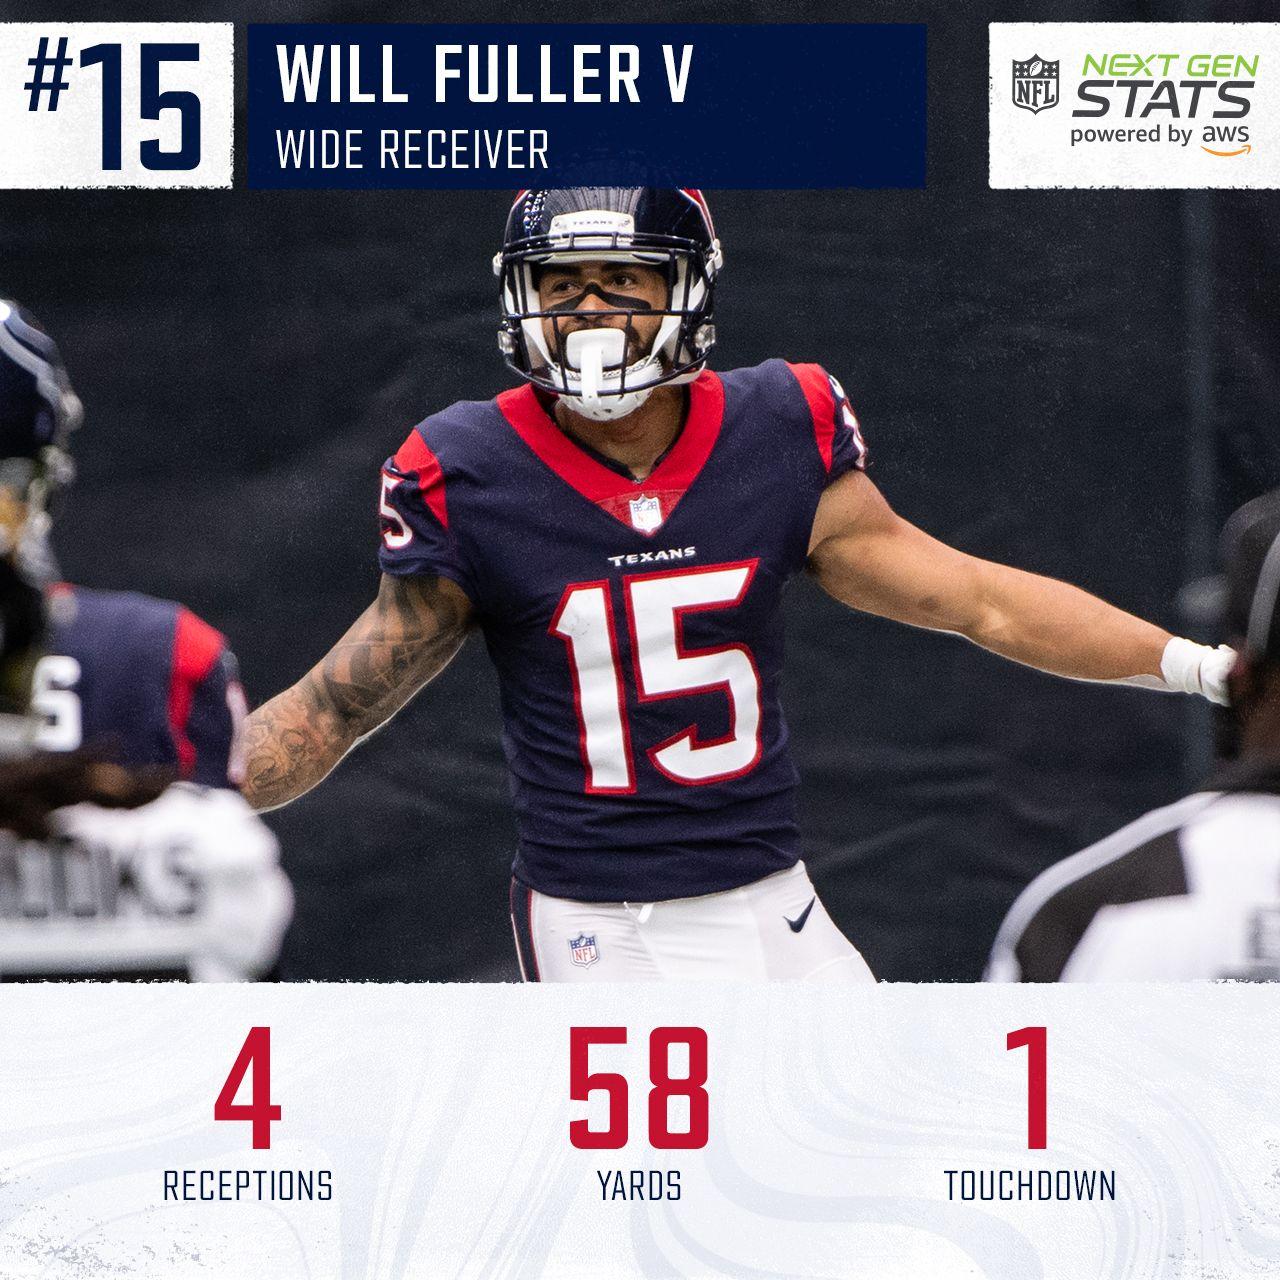 Will Fuller V